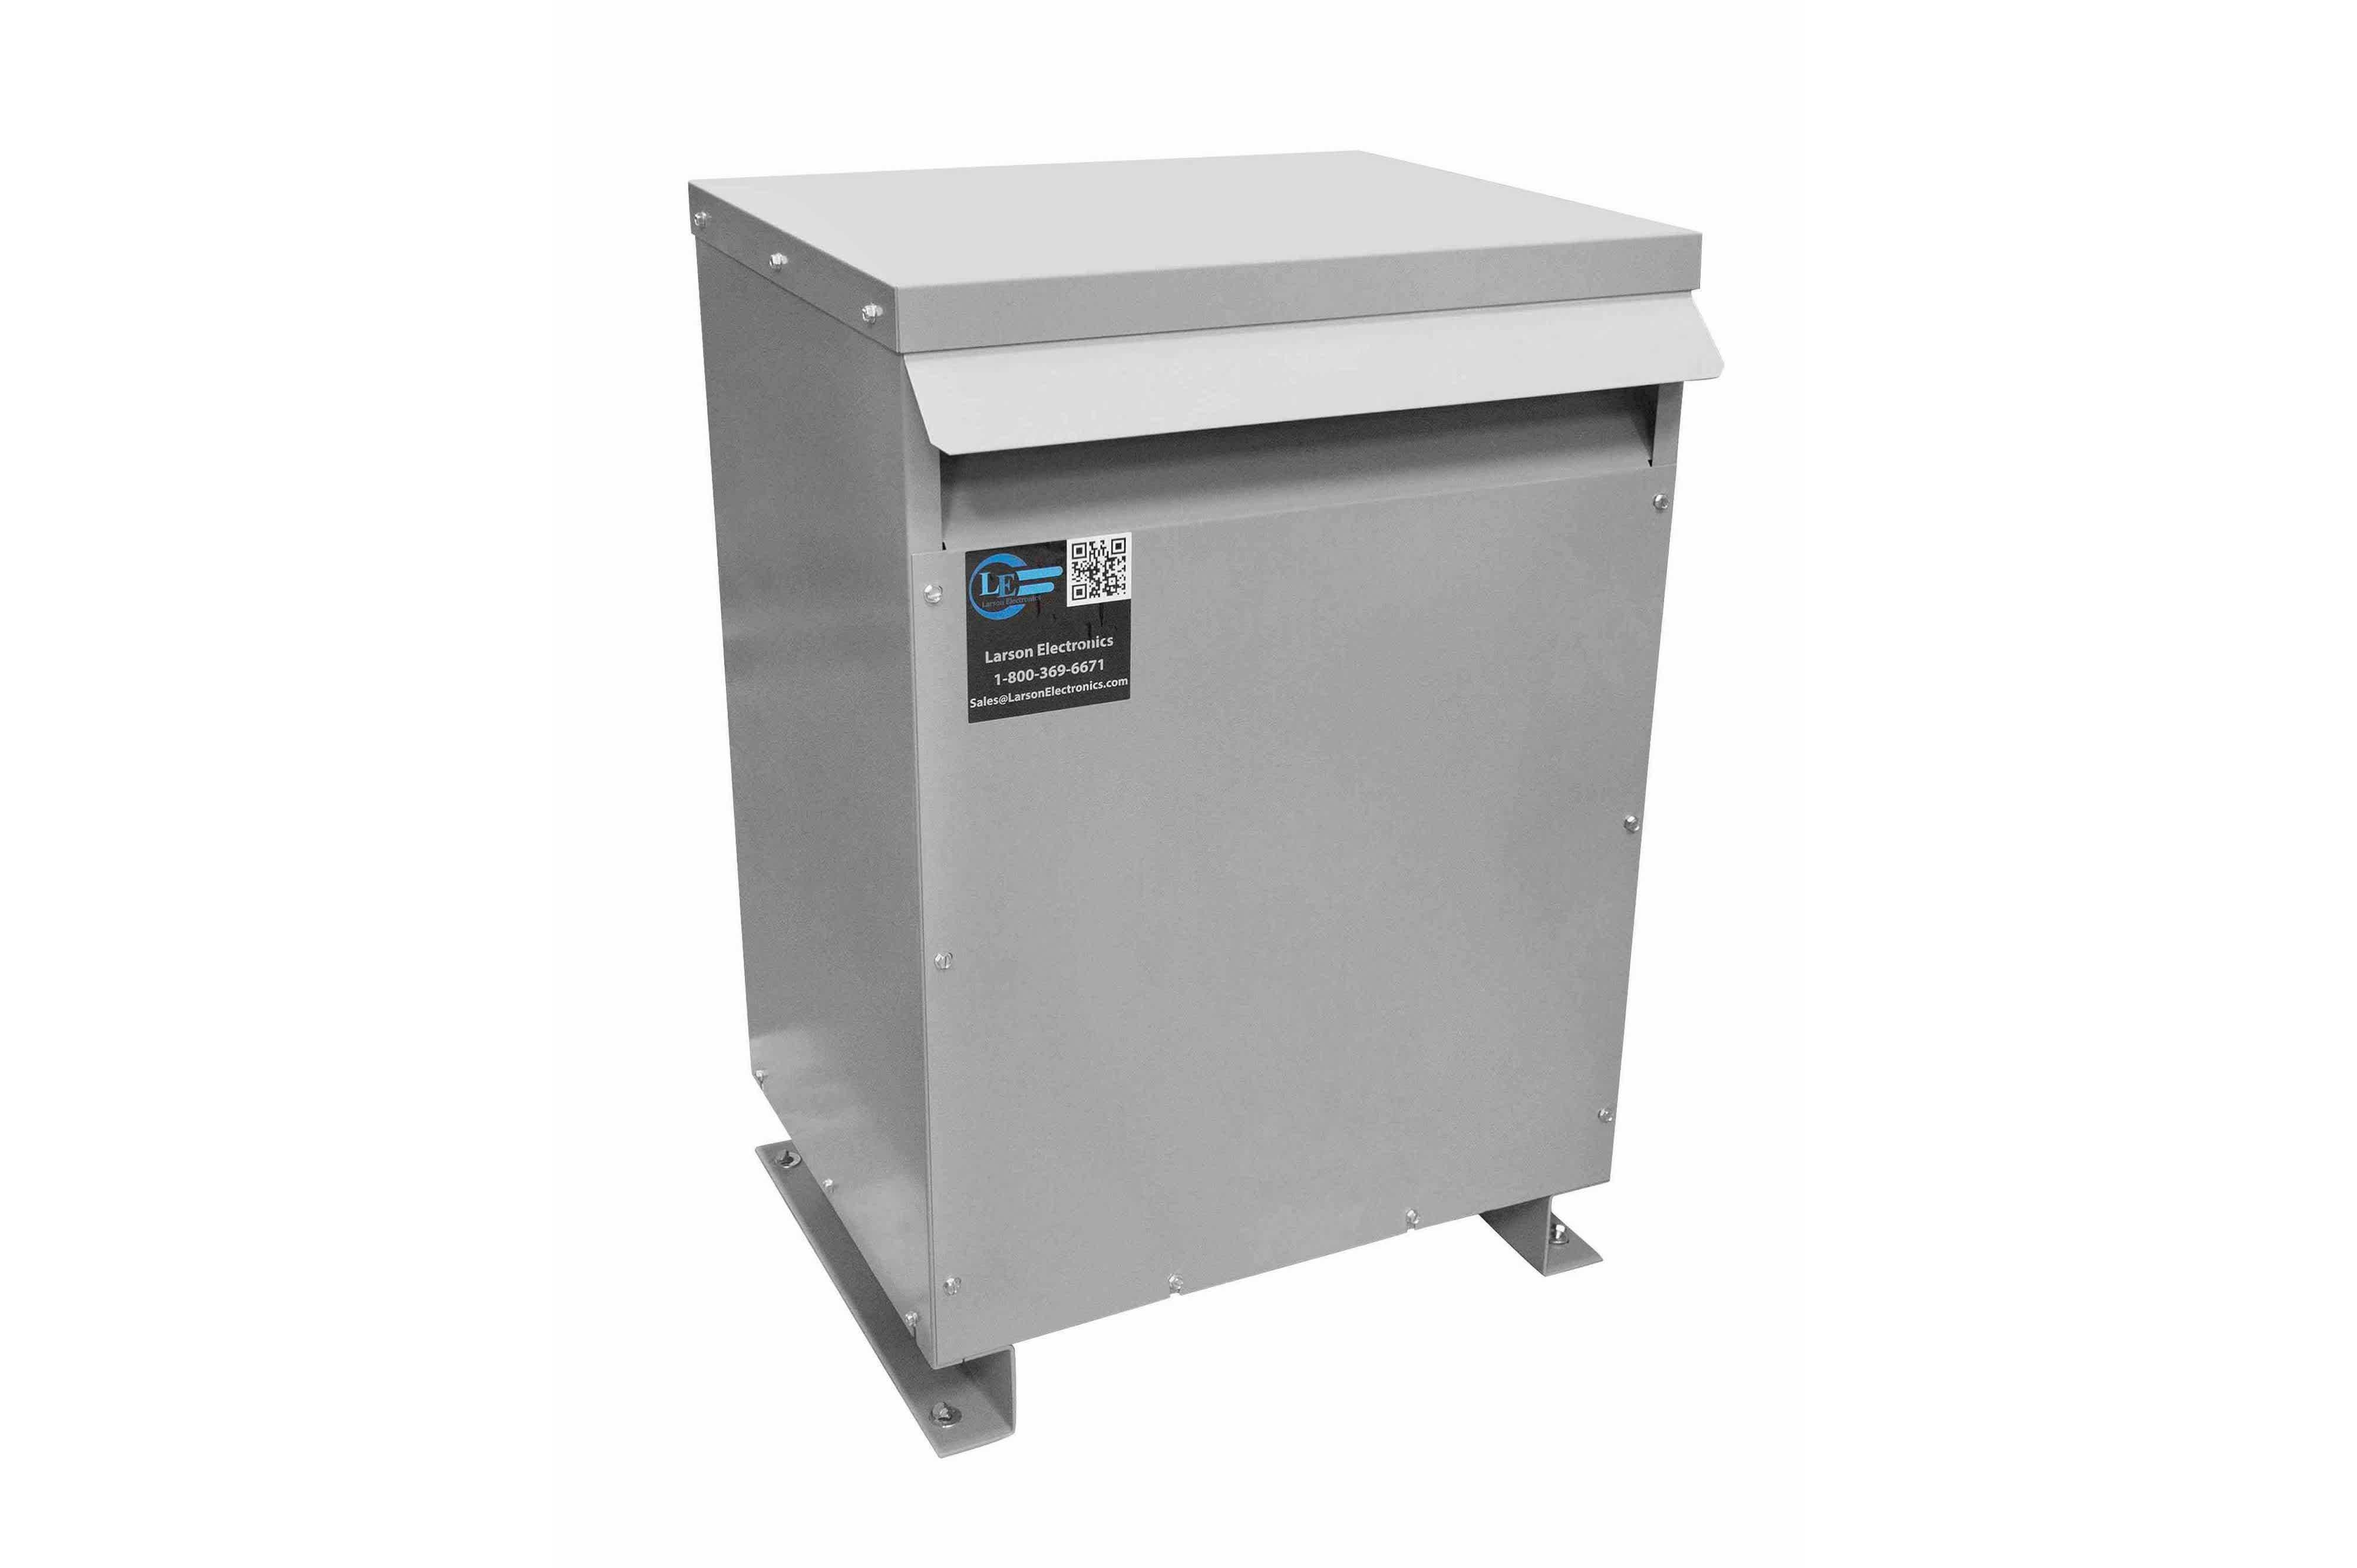 237.5 kVA 3PH Isolation Transformer, 460V Wye Primary, 240V/120 Delta Secondary, N3R, Ventilated, 60 Hz